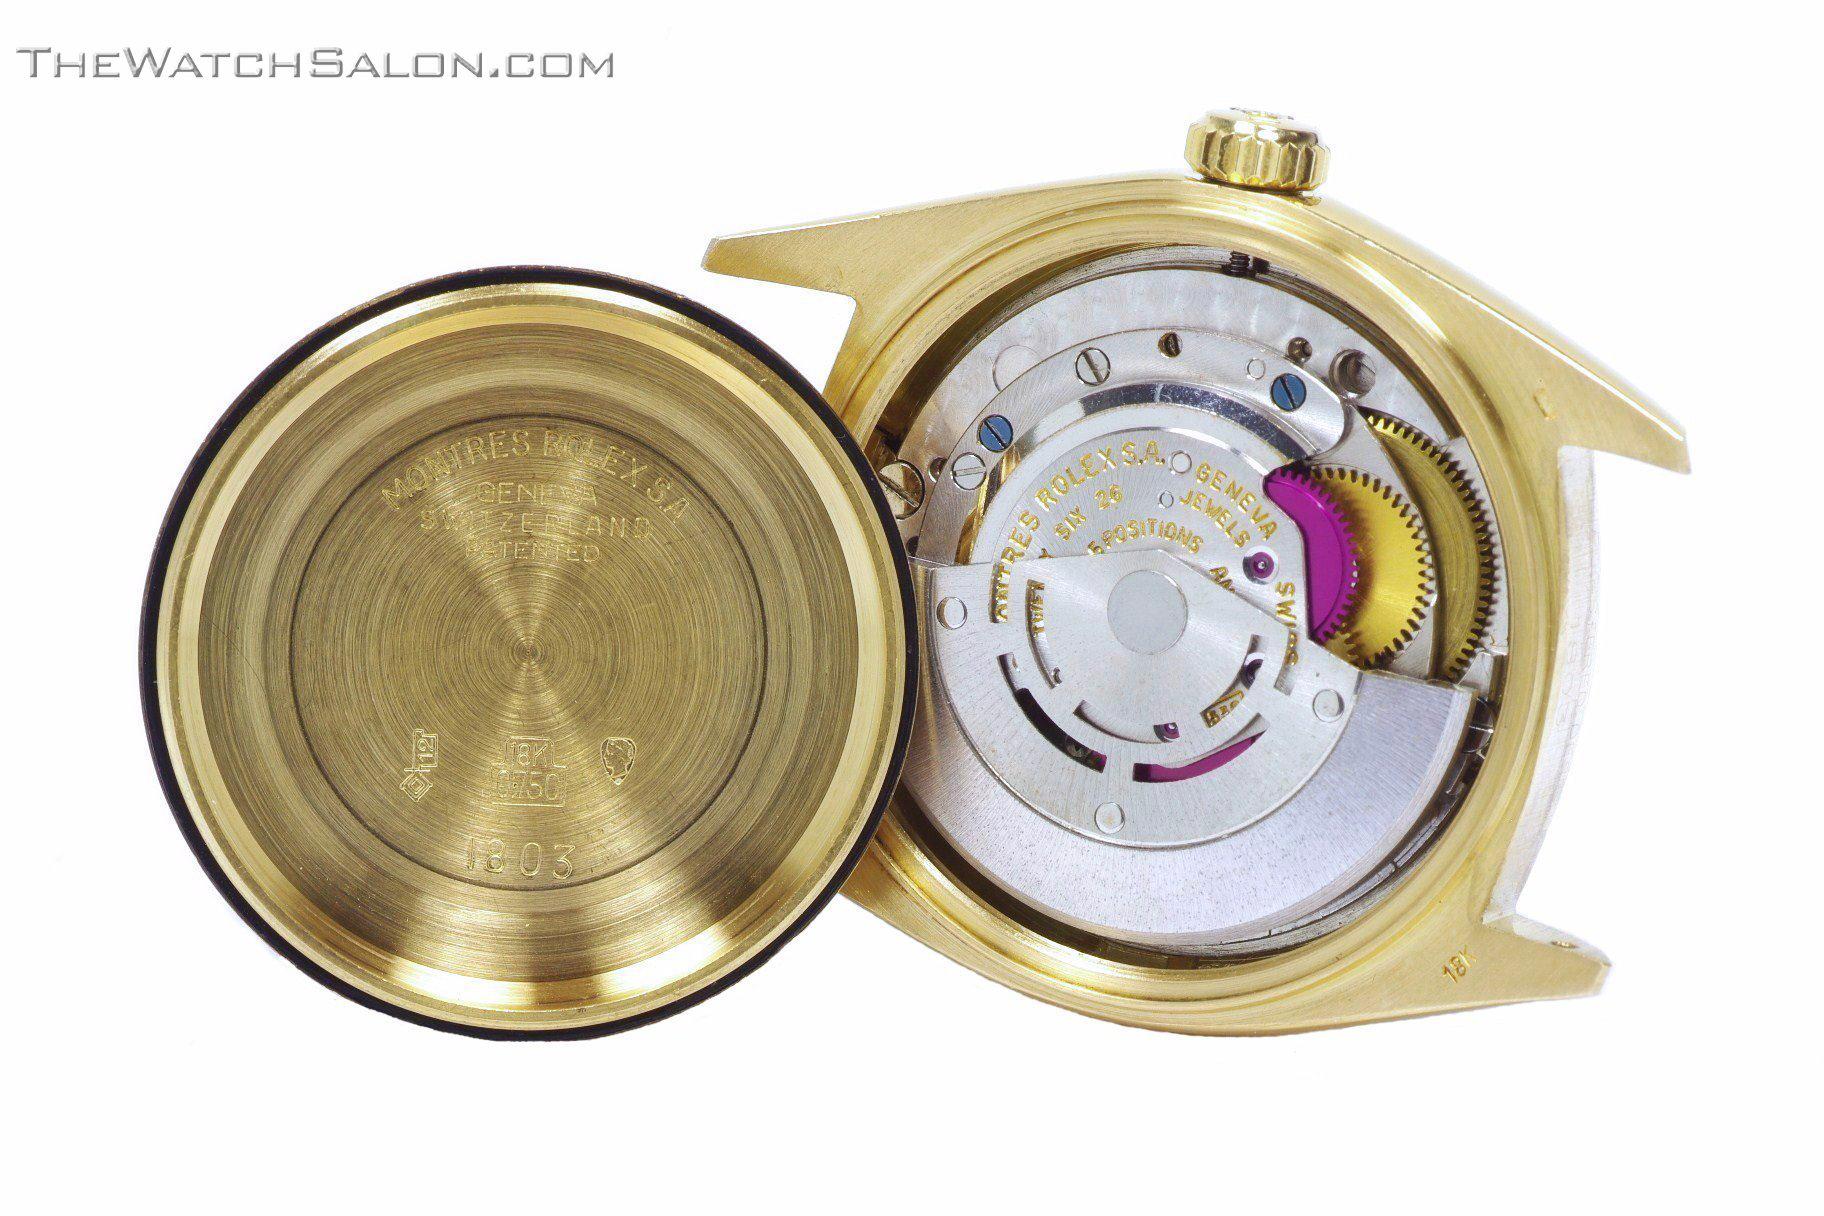 Rolex 18k gold president day date watch 1969 r56 movement